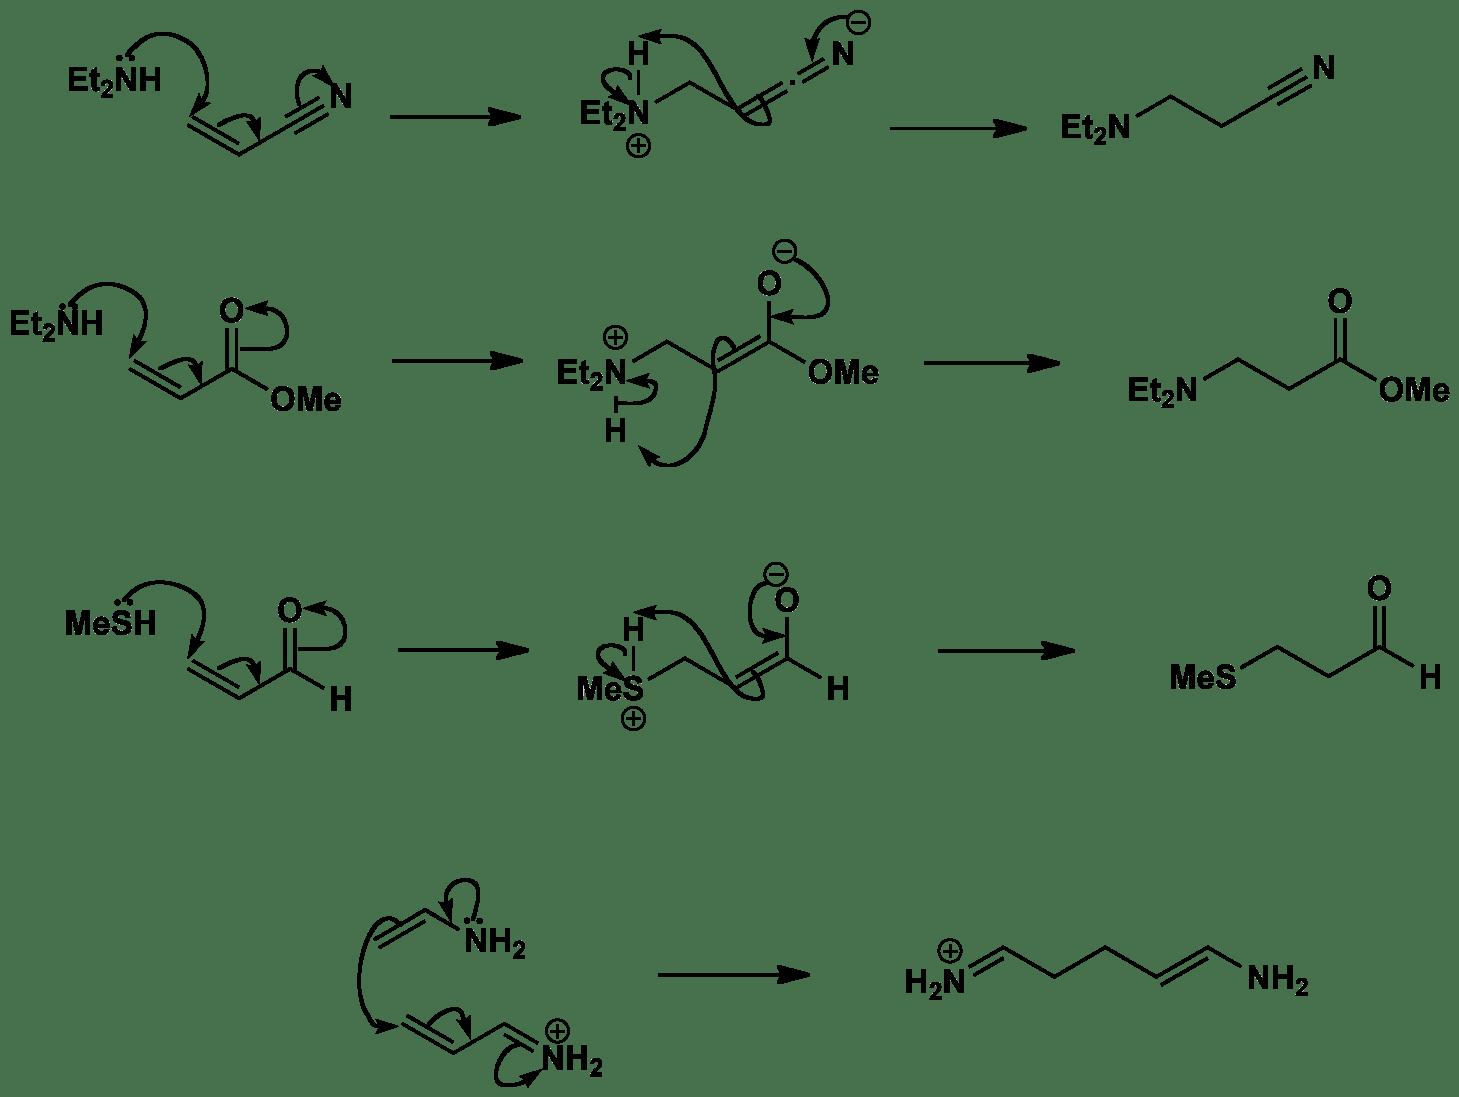 Conjugate addition mechanisms